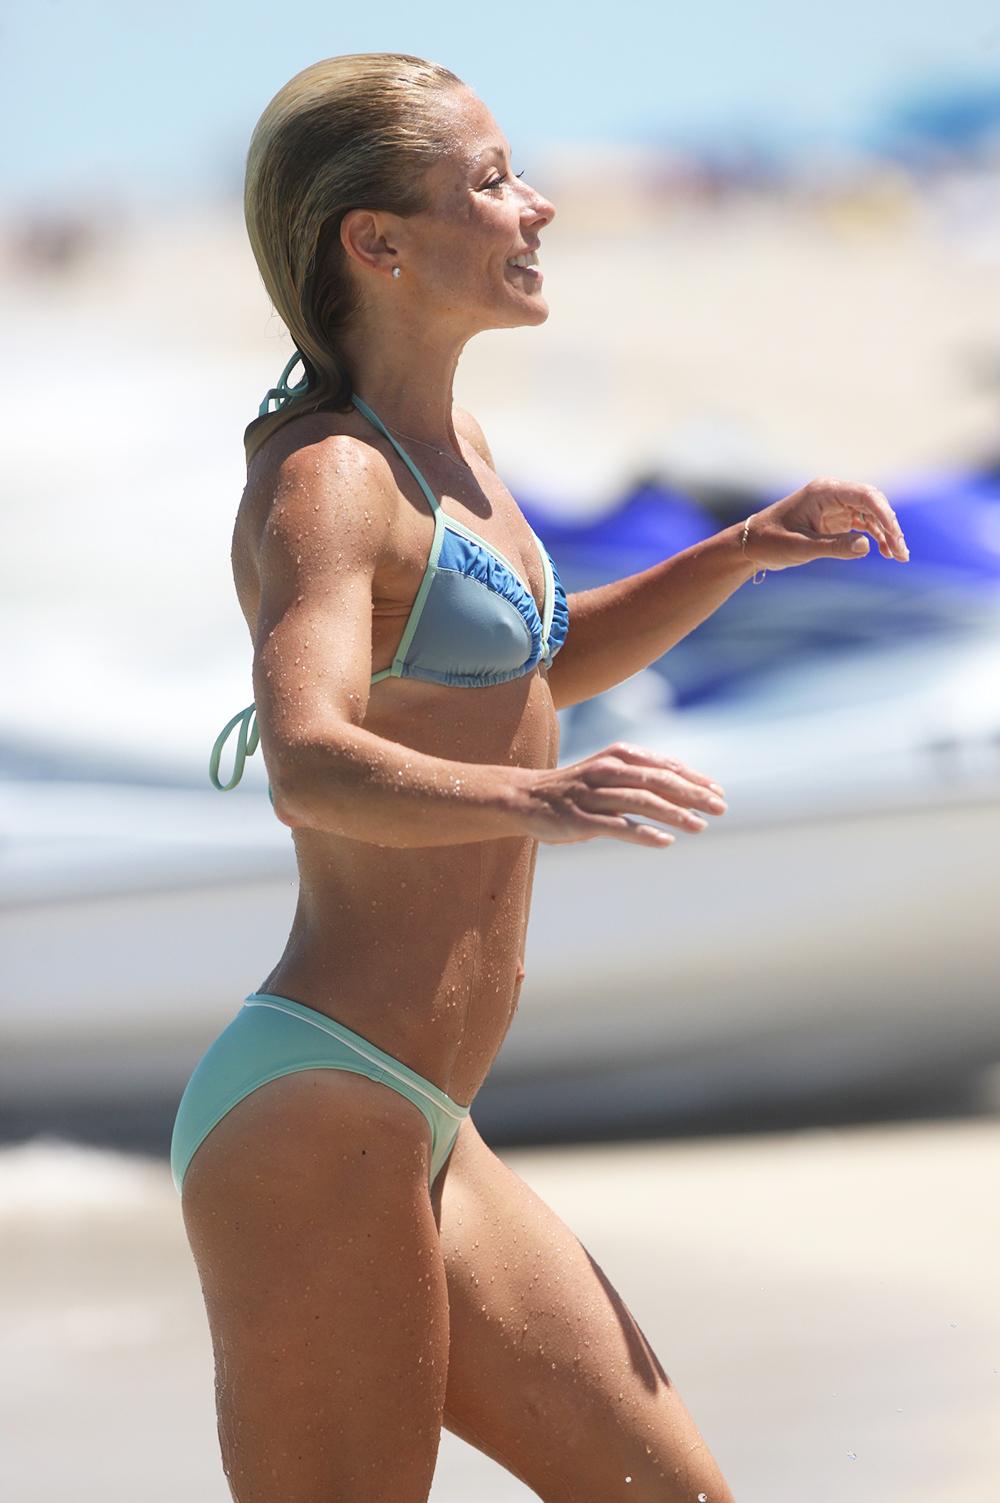 kelly-ripa-bikini-pics-naked-bbw-video